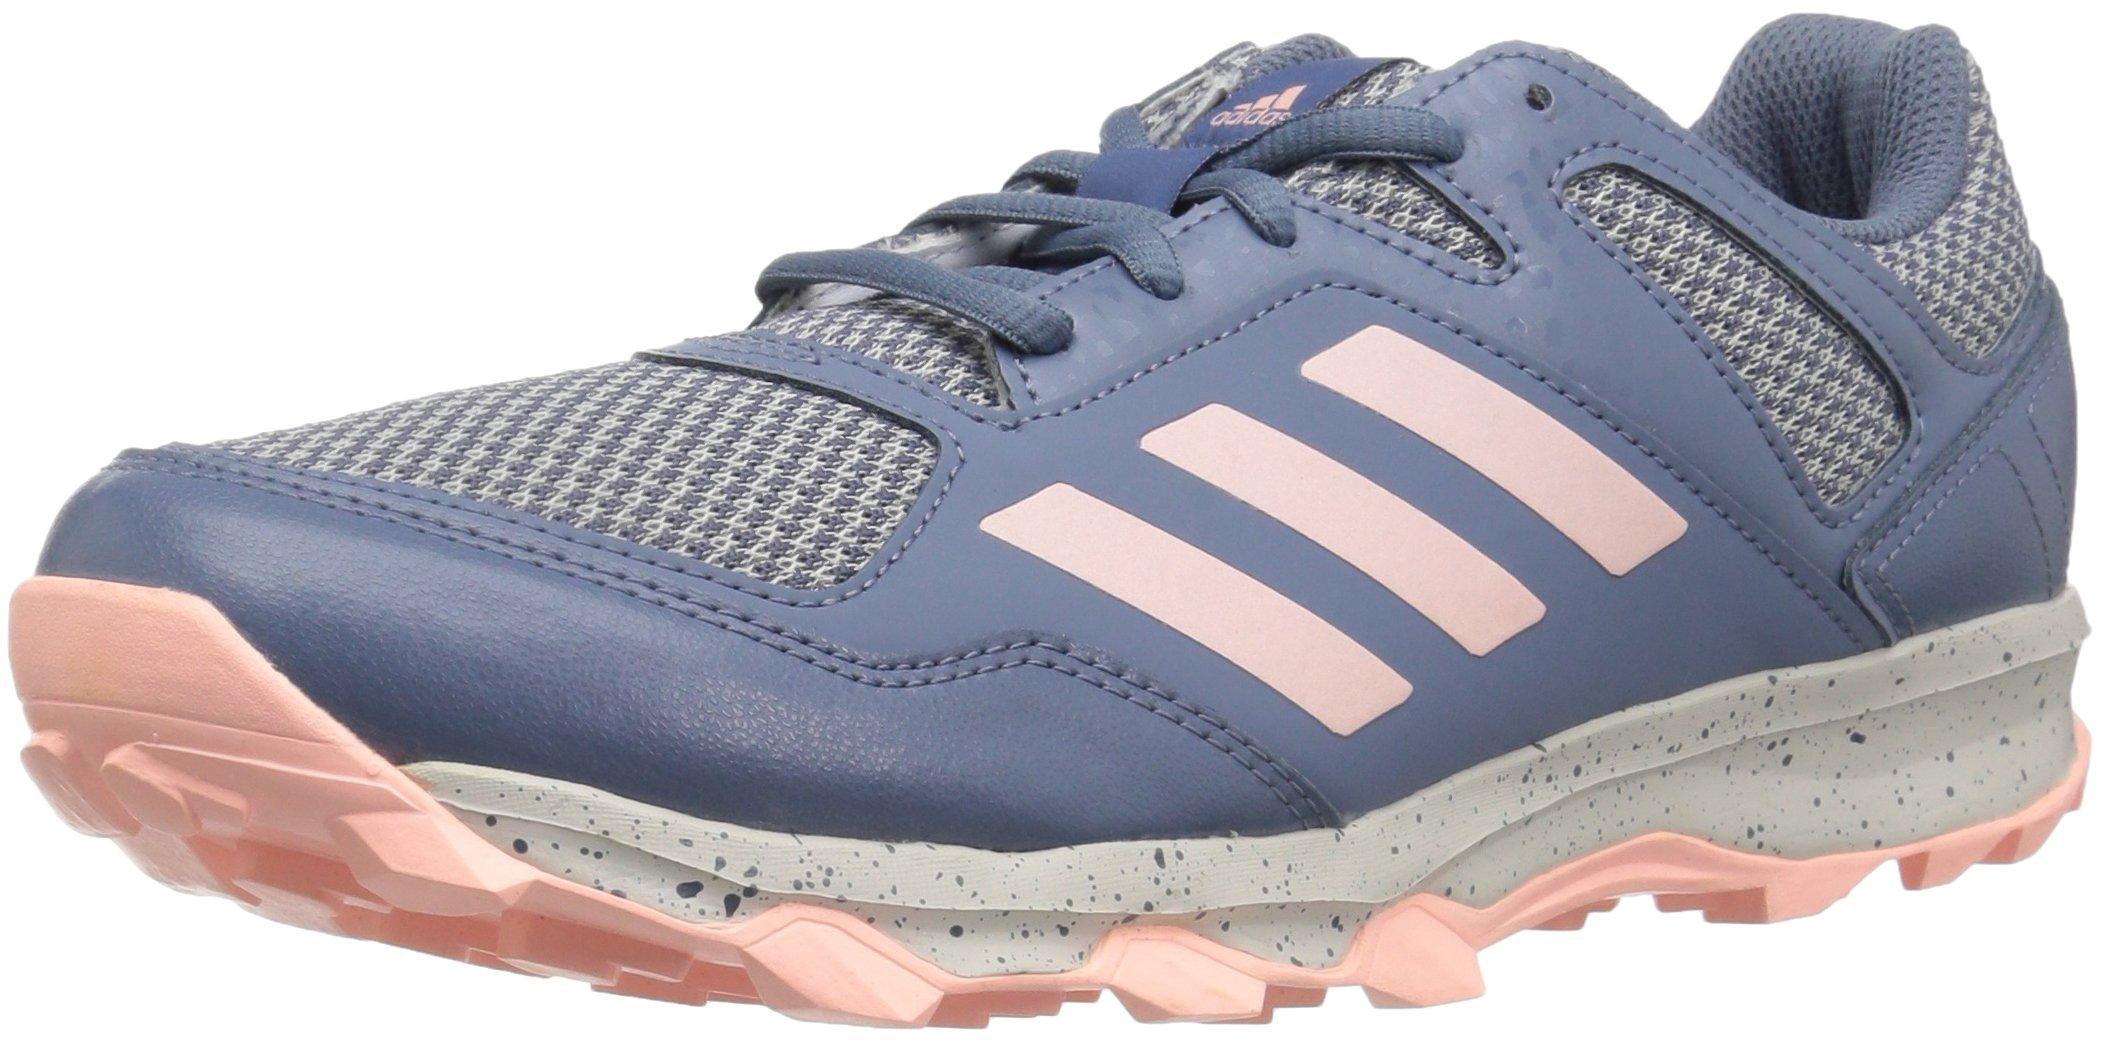 adidas Women's Fabela Rise Volleyball Shoe, Raw Steel/Clear Orange/Grey, 7 M US